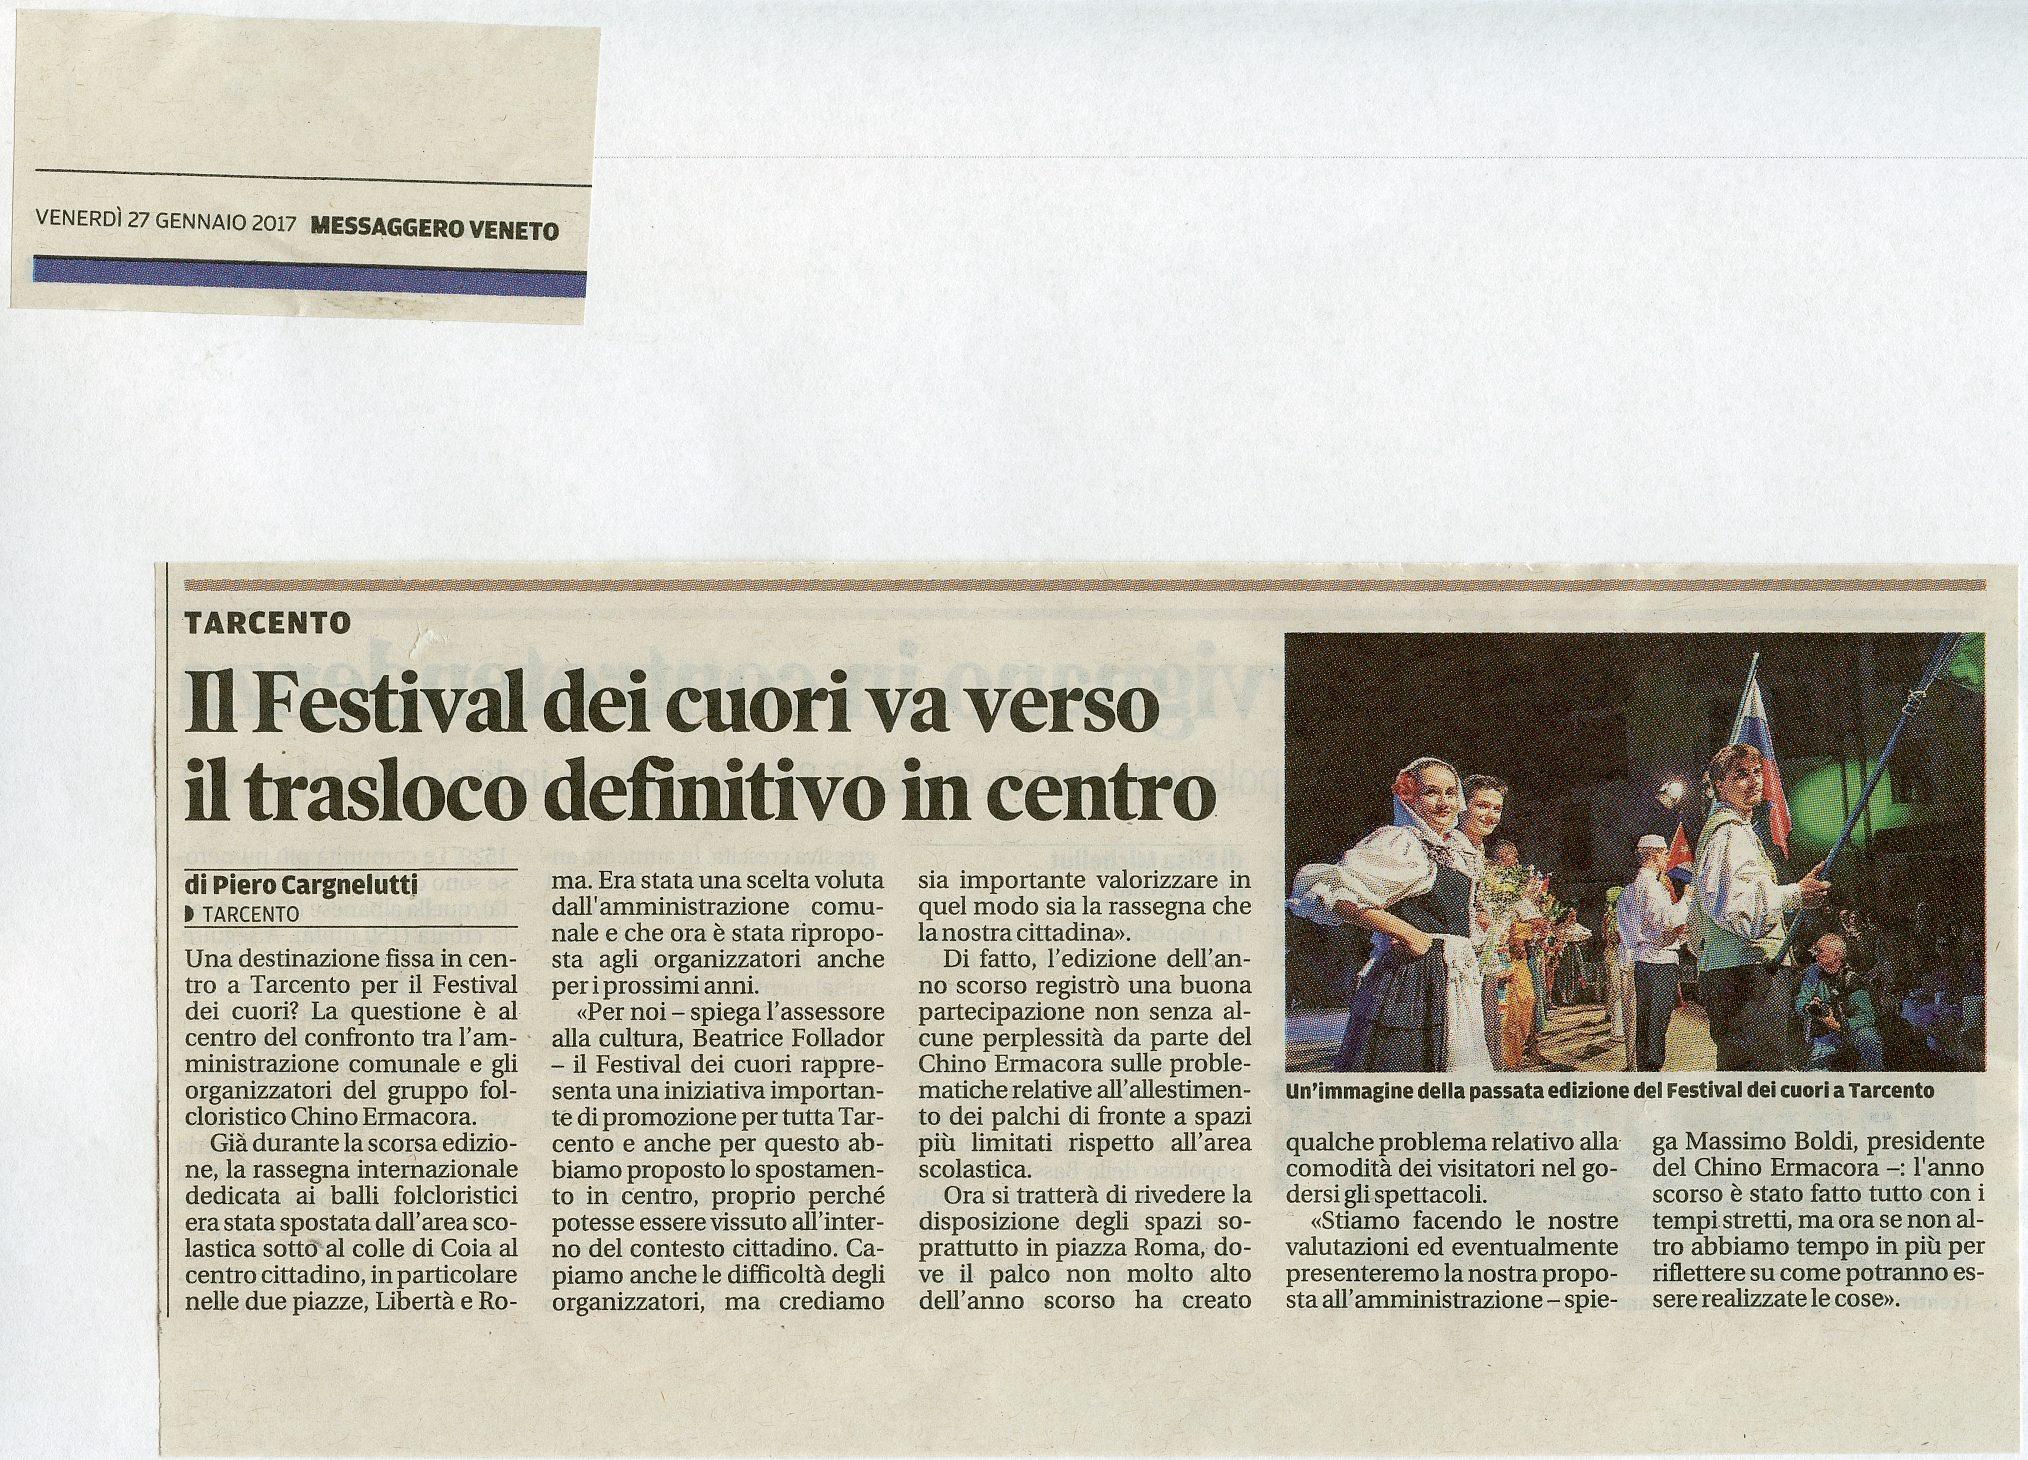 Messaggero Veneto 27.01.2017